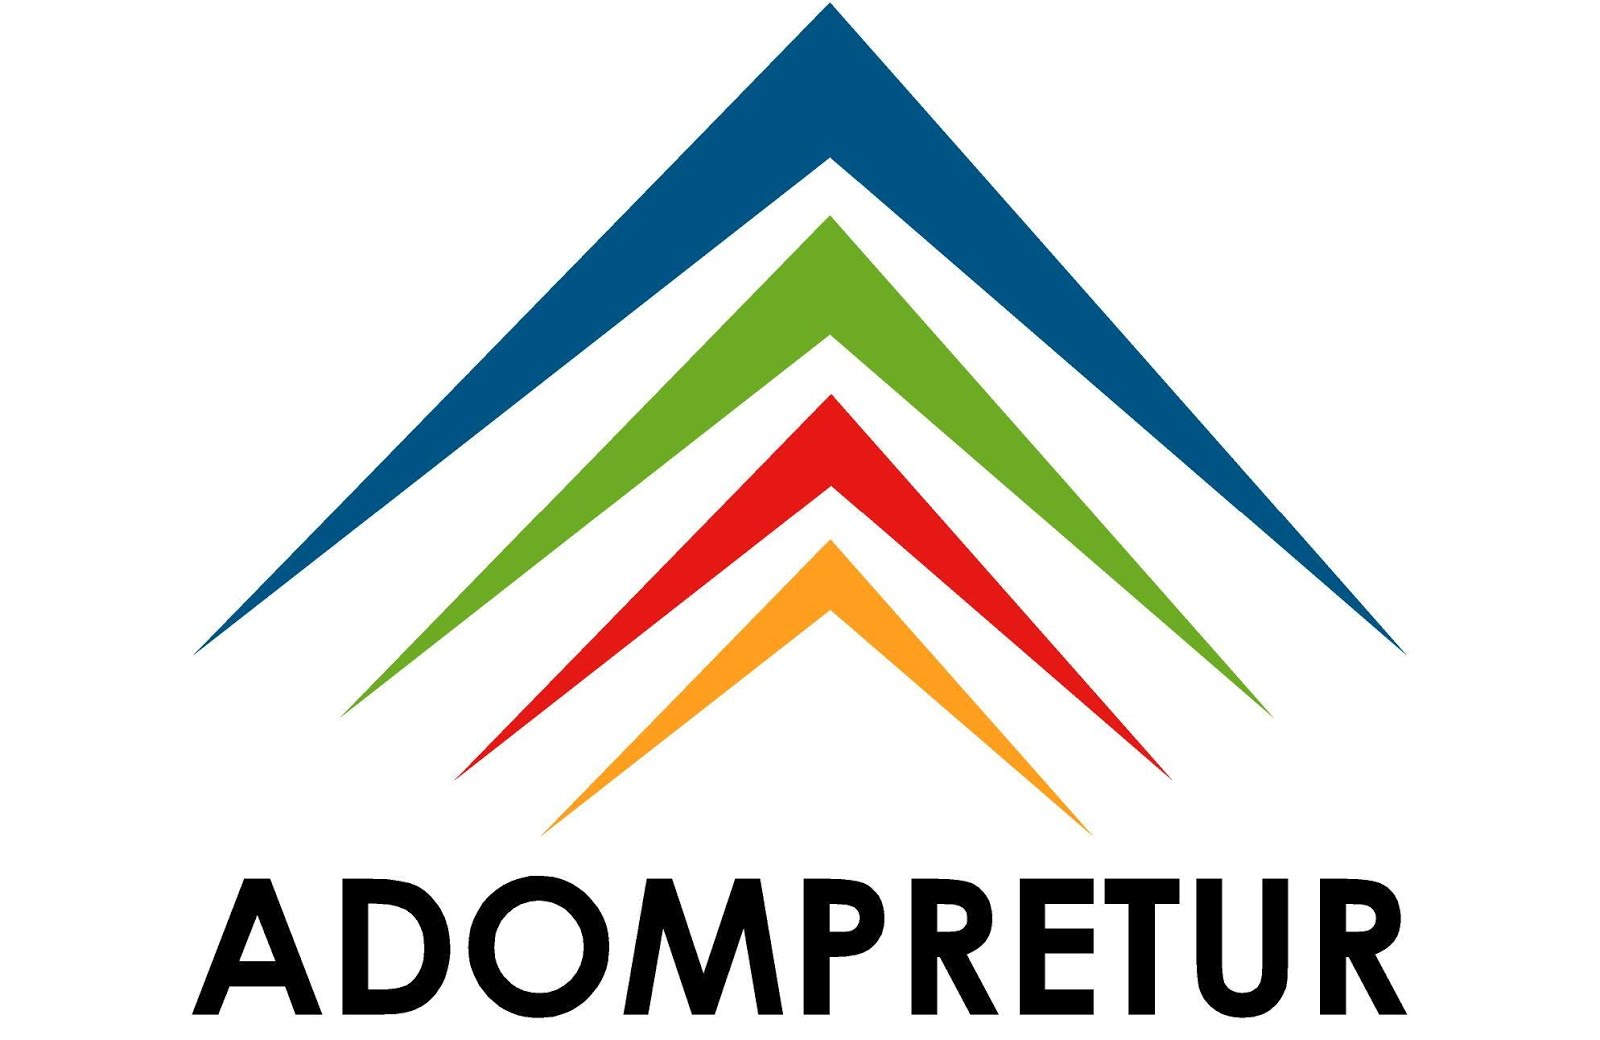 Adompretur